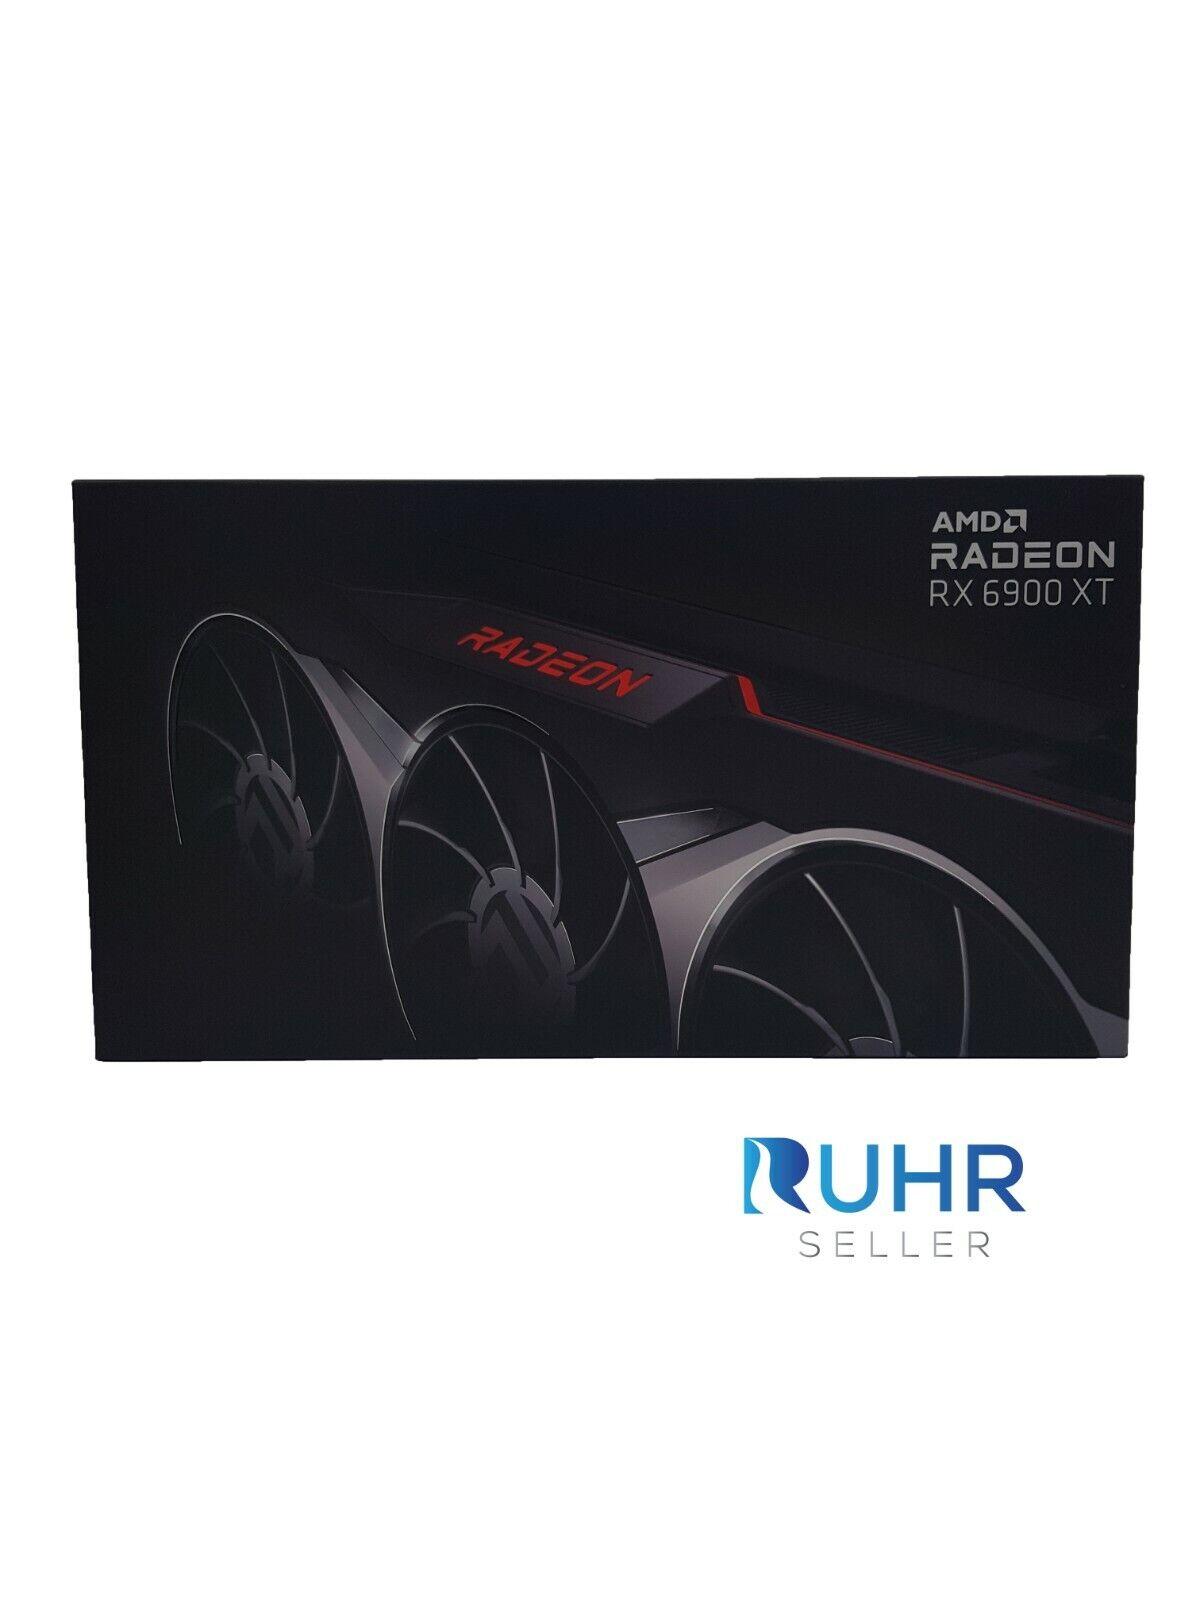 AMD Radeon RX 6900 XT 16GB GDDR6 Grafikkarte (100-438386) |Neu|OVP|Gewerblich